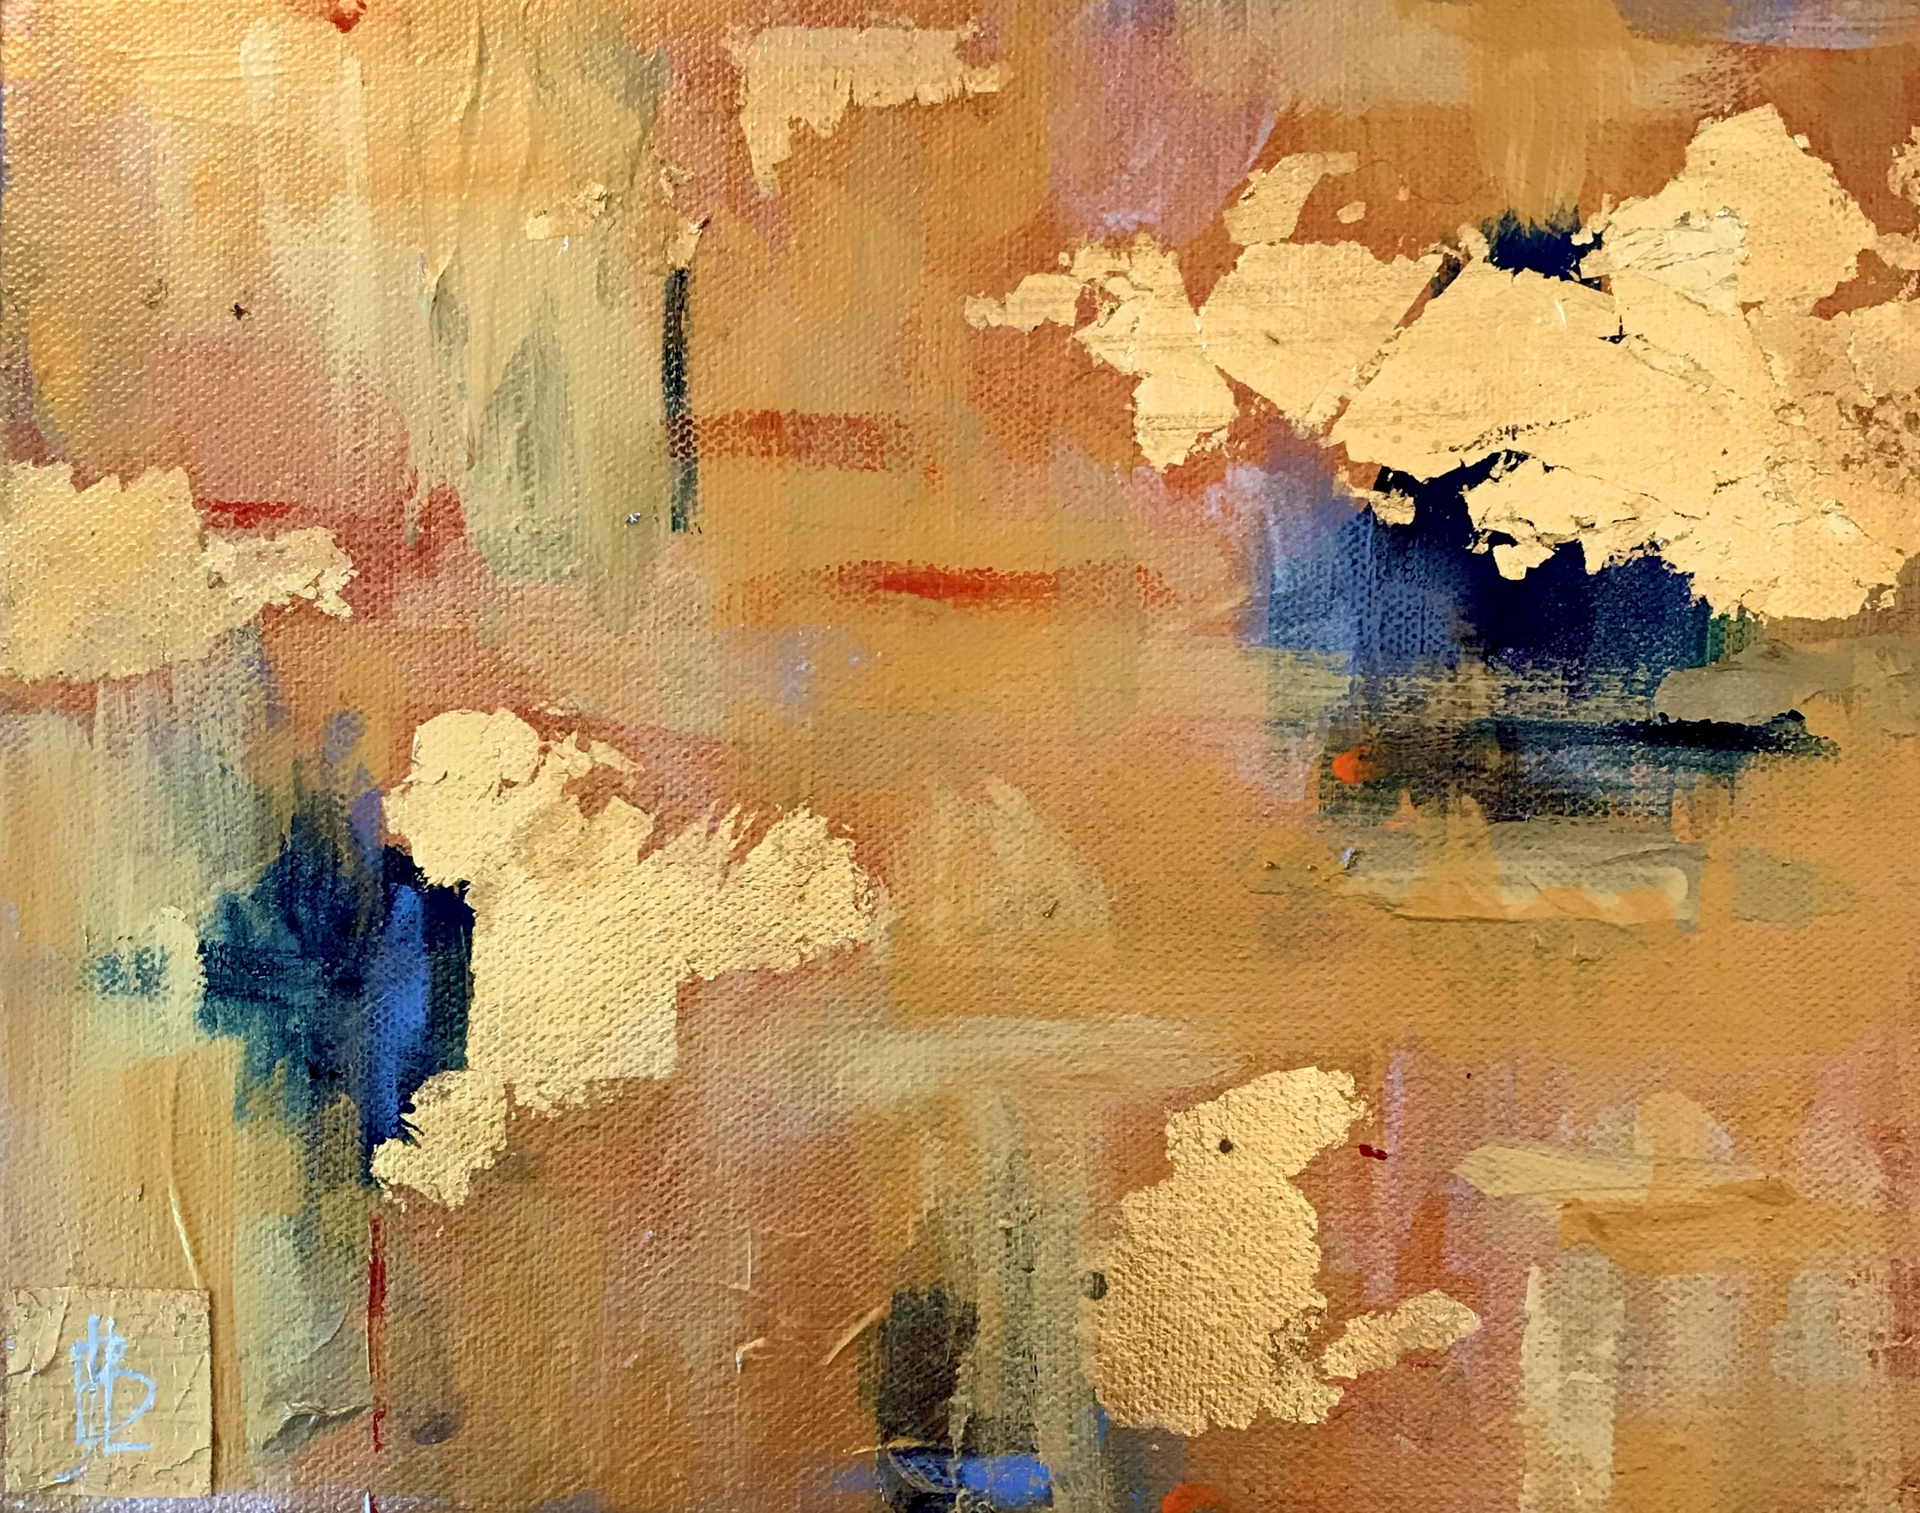 Beauty No. 16 by Leslie Poteet Busker